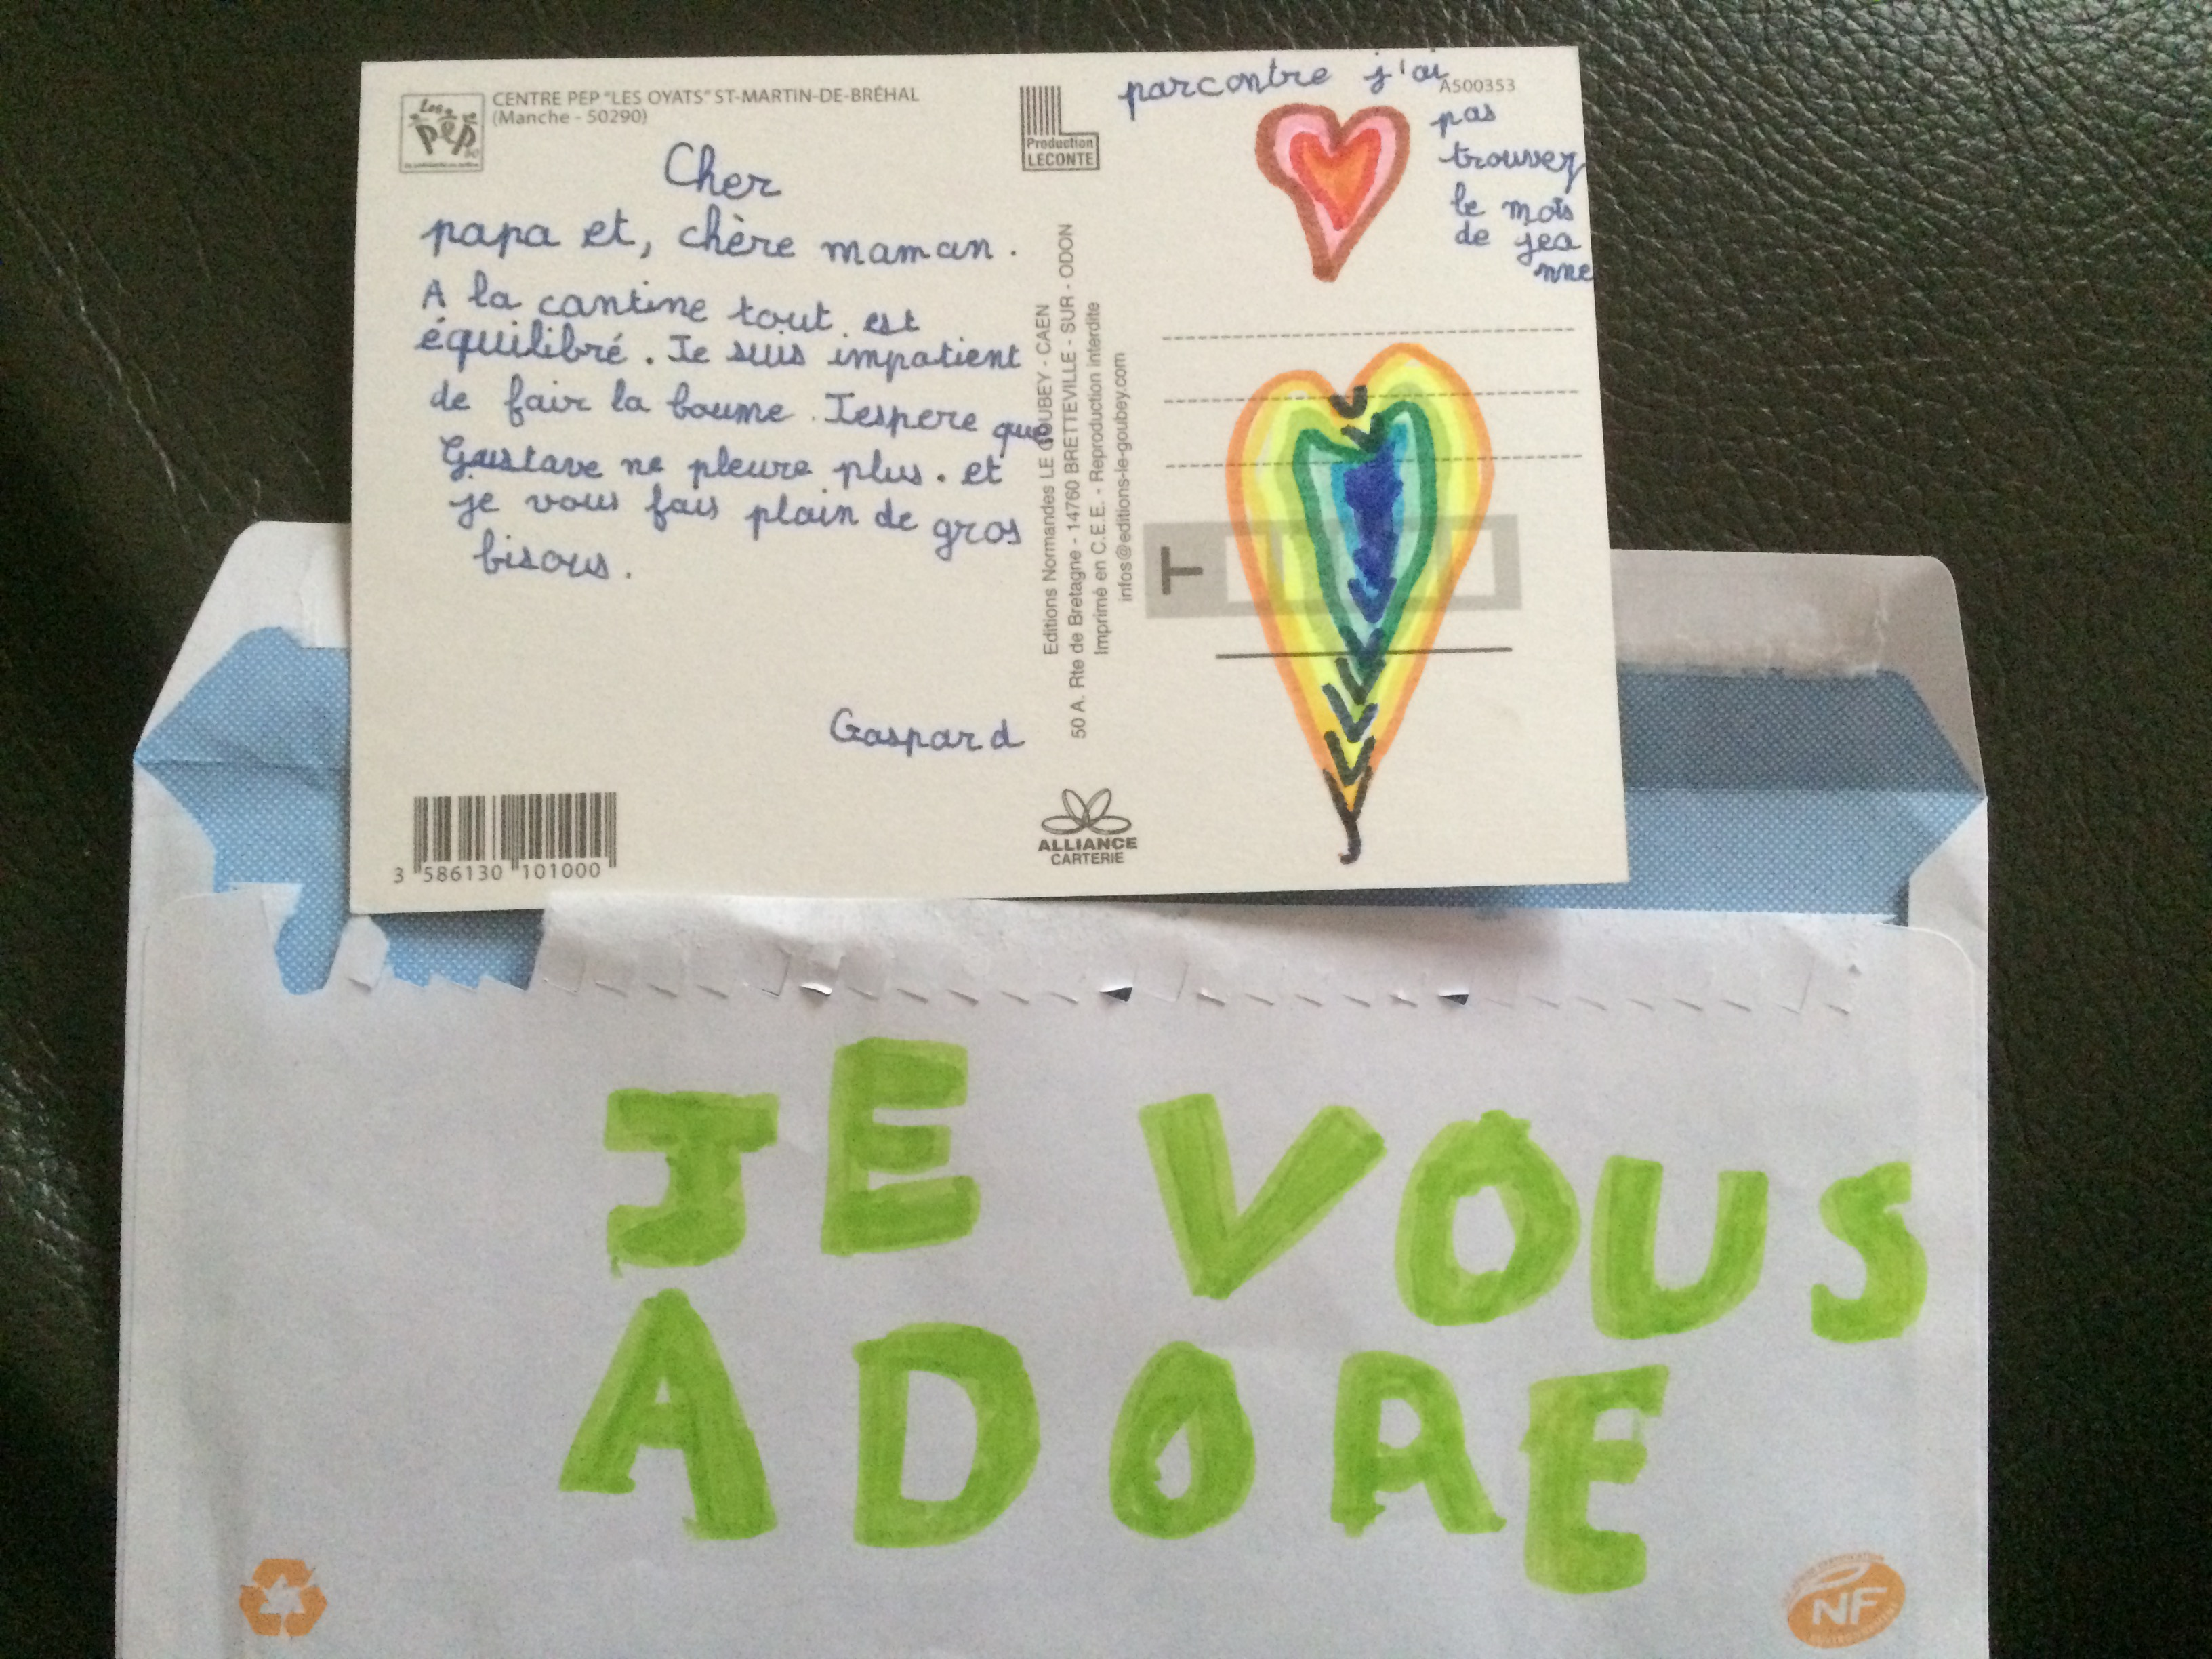 La carte postale de Gaspard